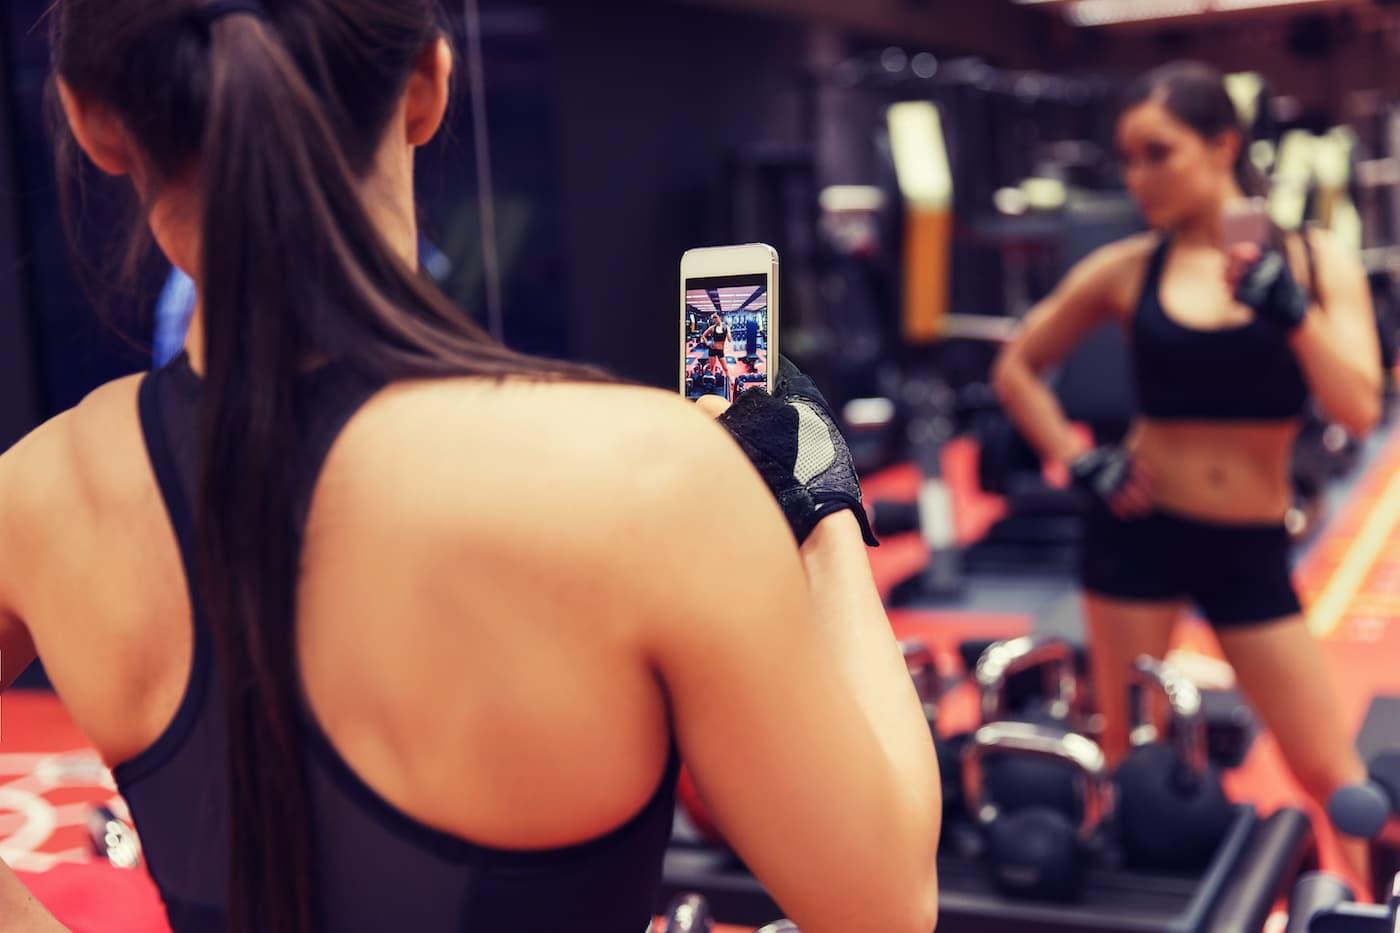 The Best TikTok Fitness Influencers